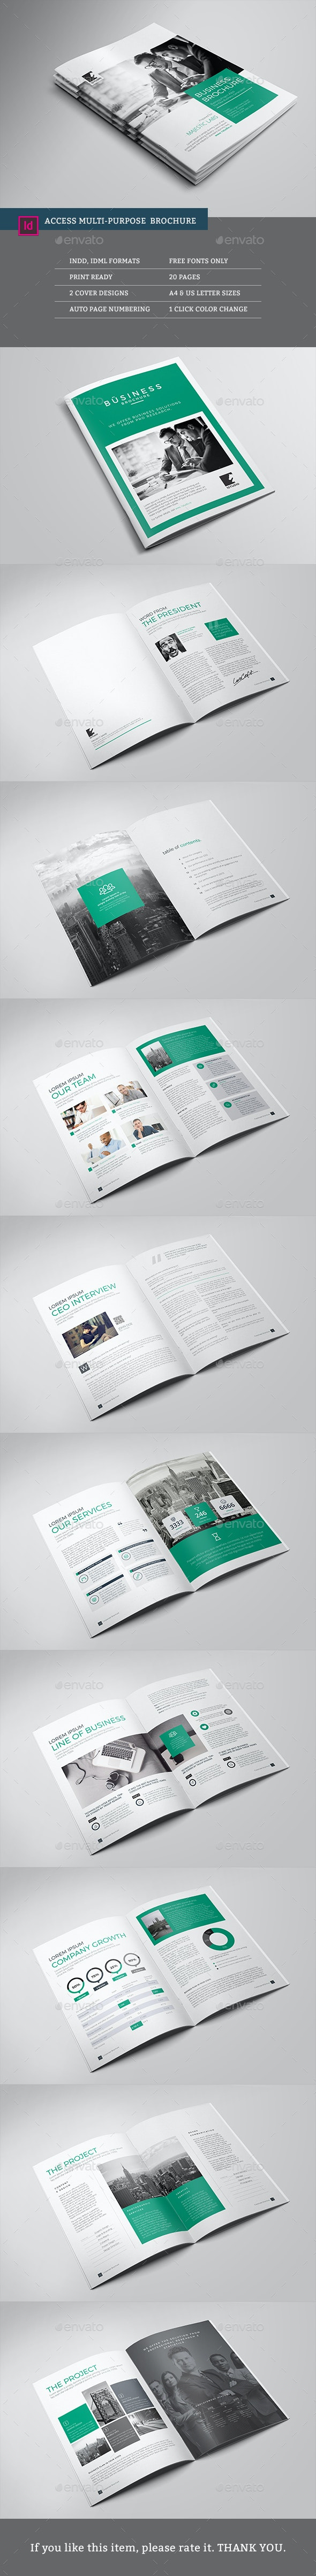 Access Multipurpose Brochure - Corporate Brochures